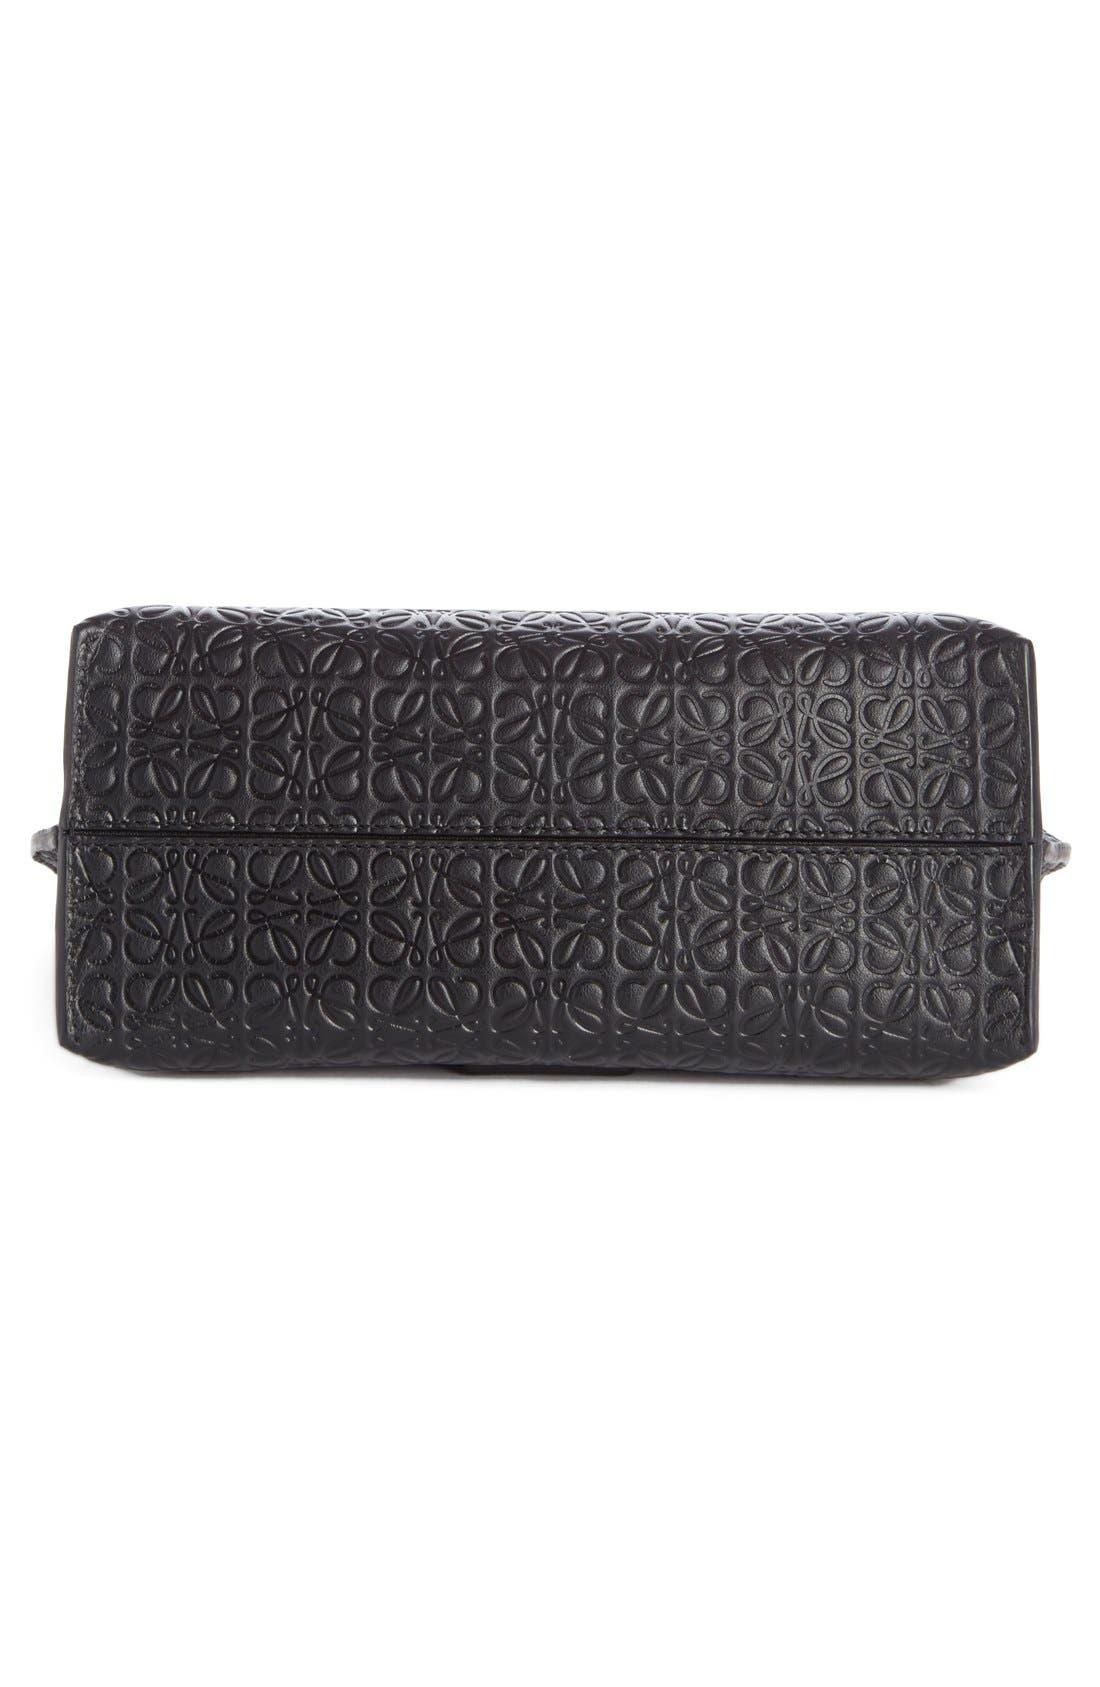 'Avenue' Embossed Calfskin Leather Crossbody Bag,                             Alternate thumbnail 4, color,                             Black